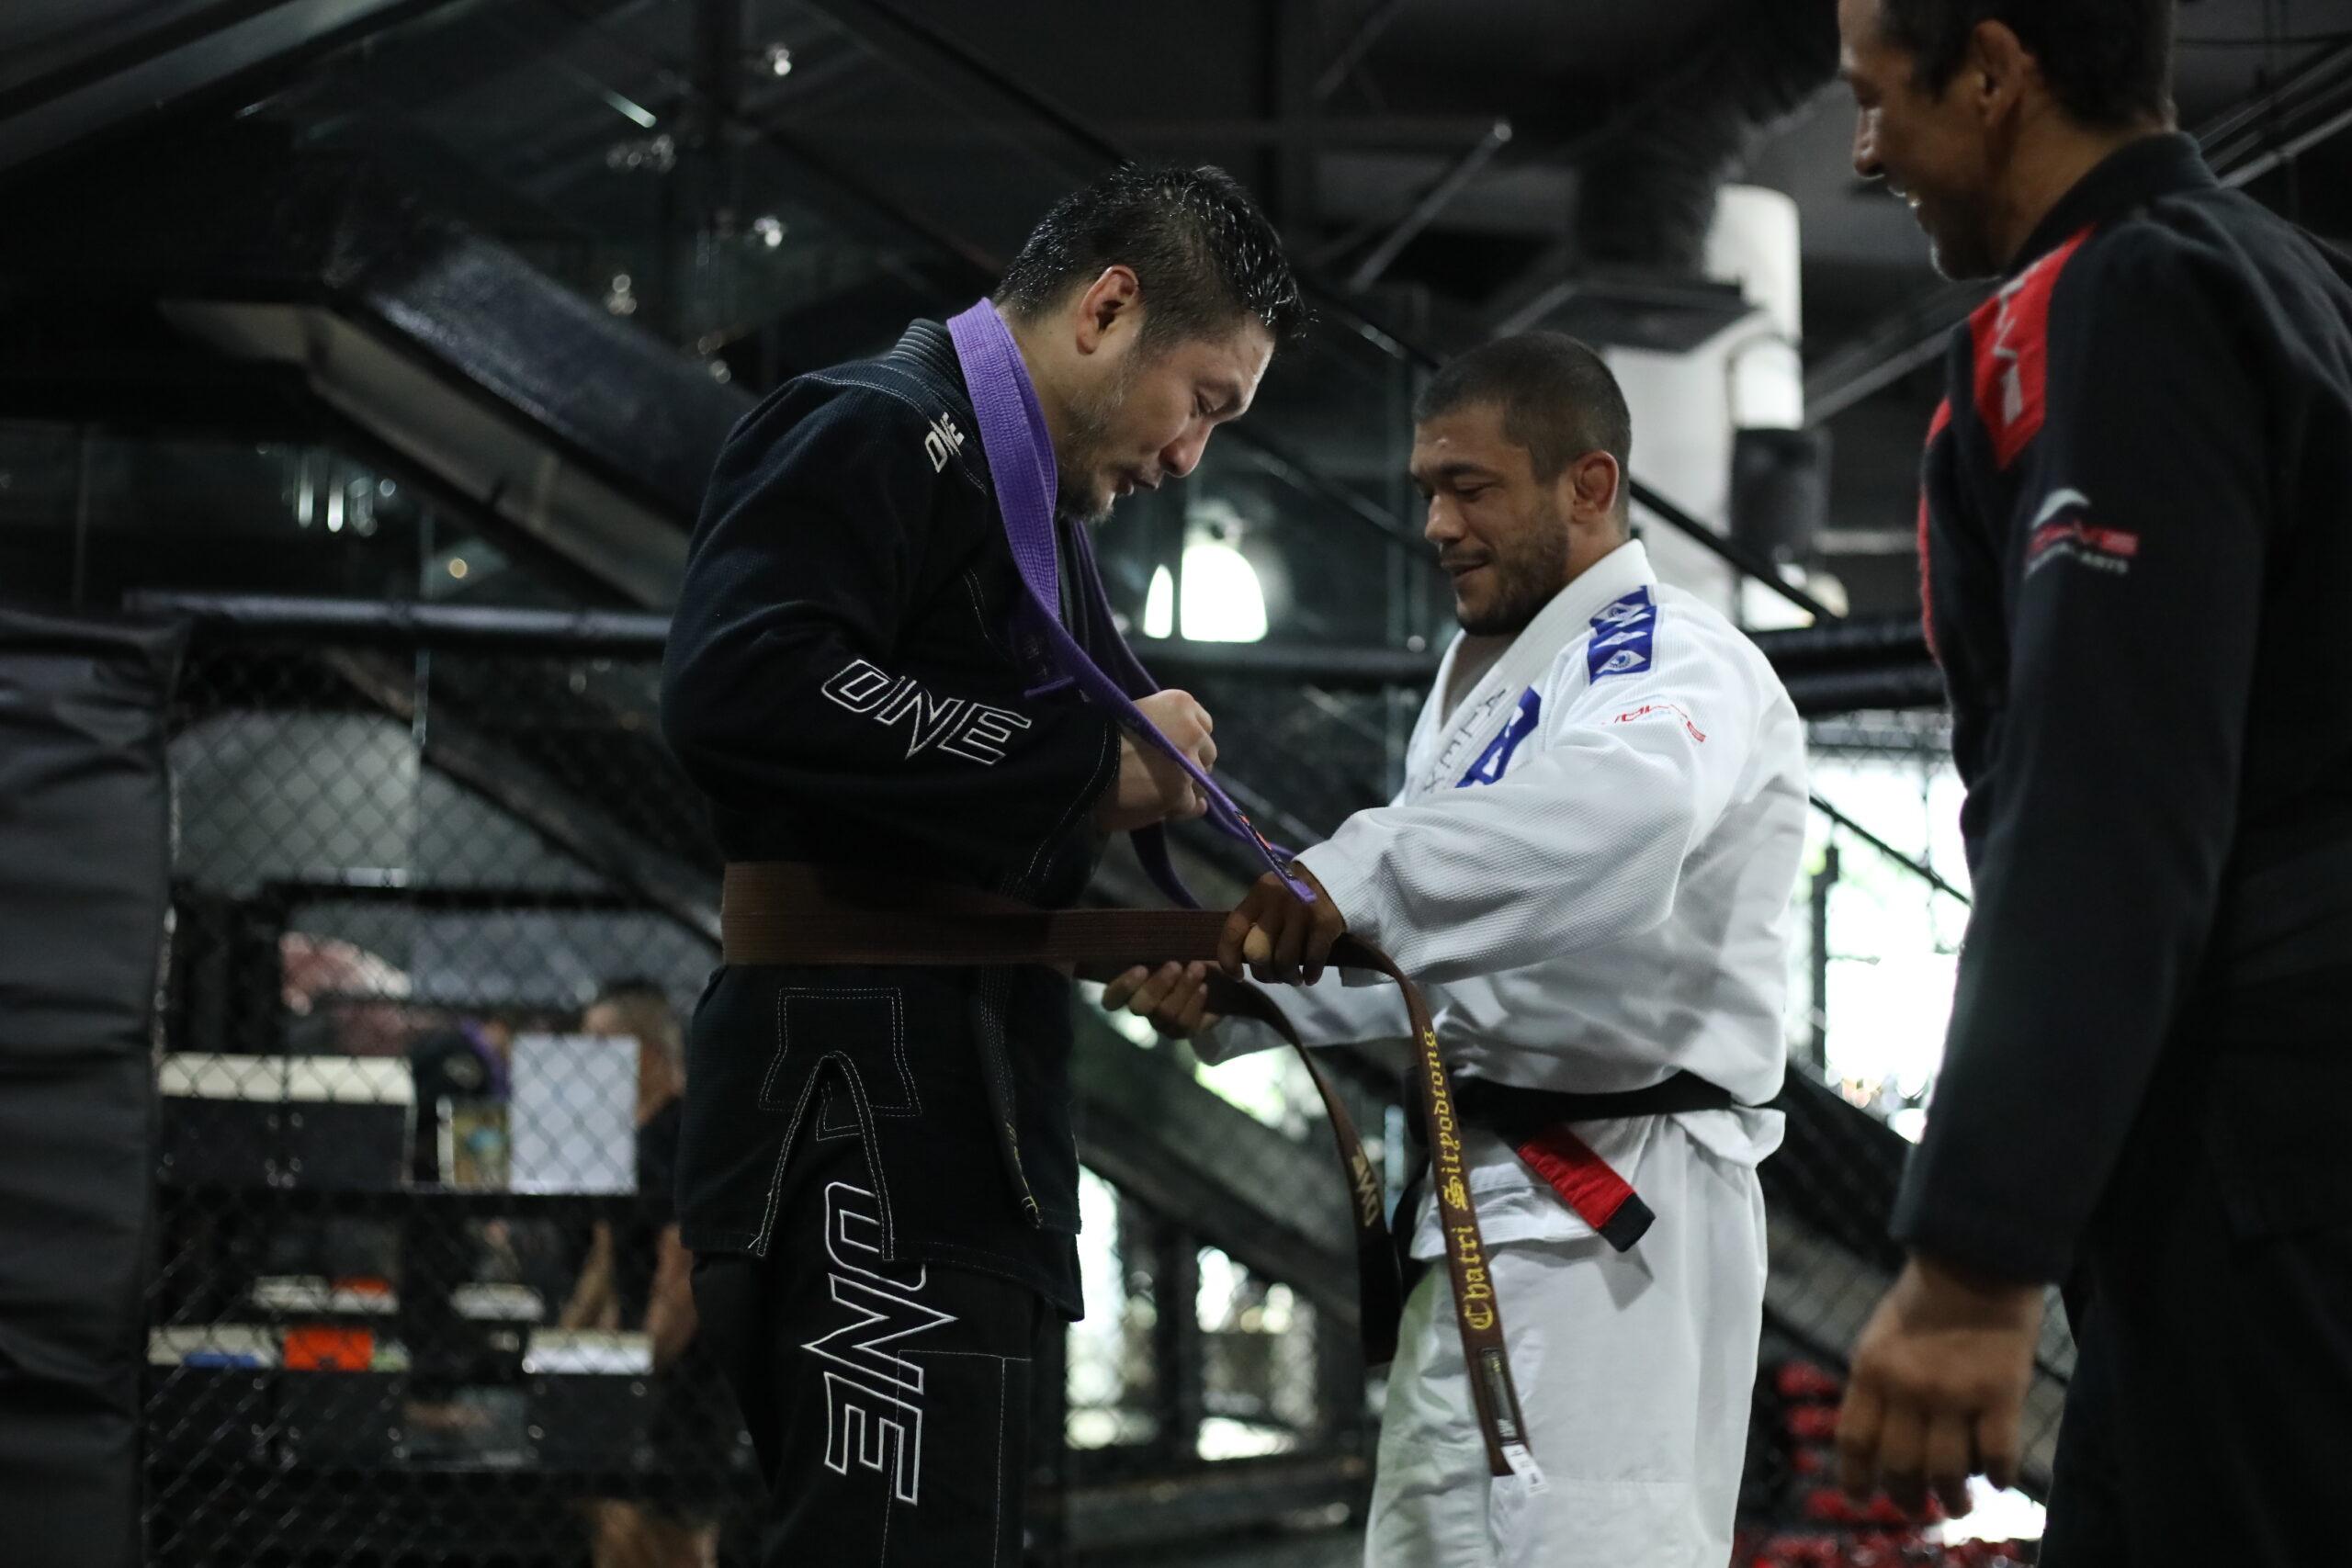 I Received My Brown Belt In Jiu-Jitsu!